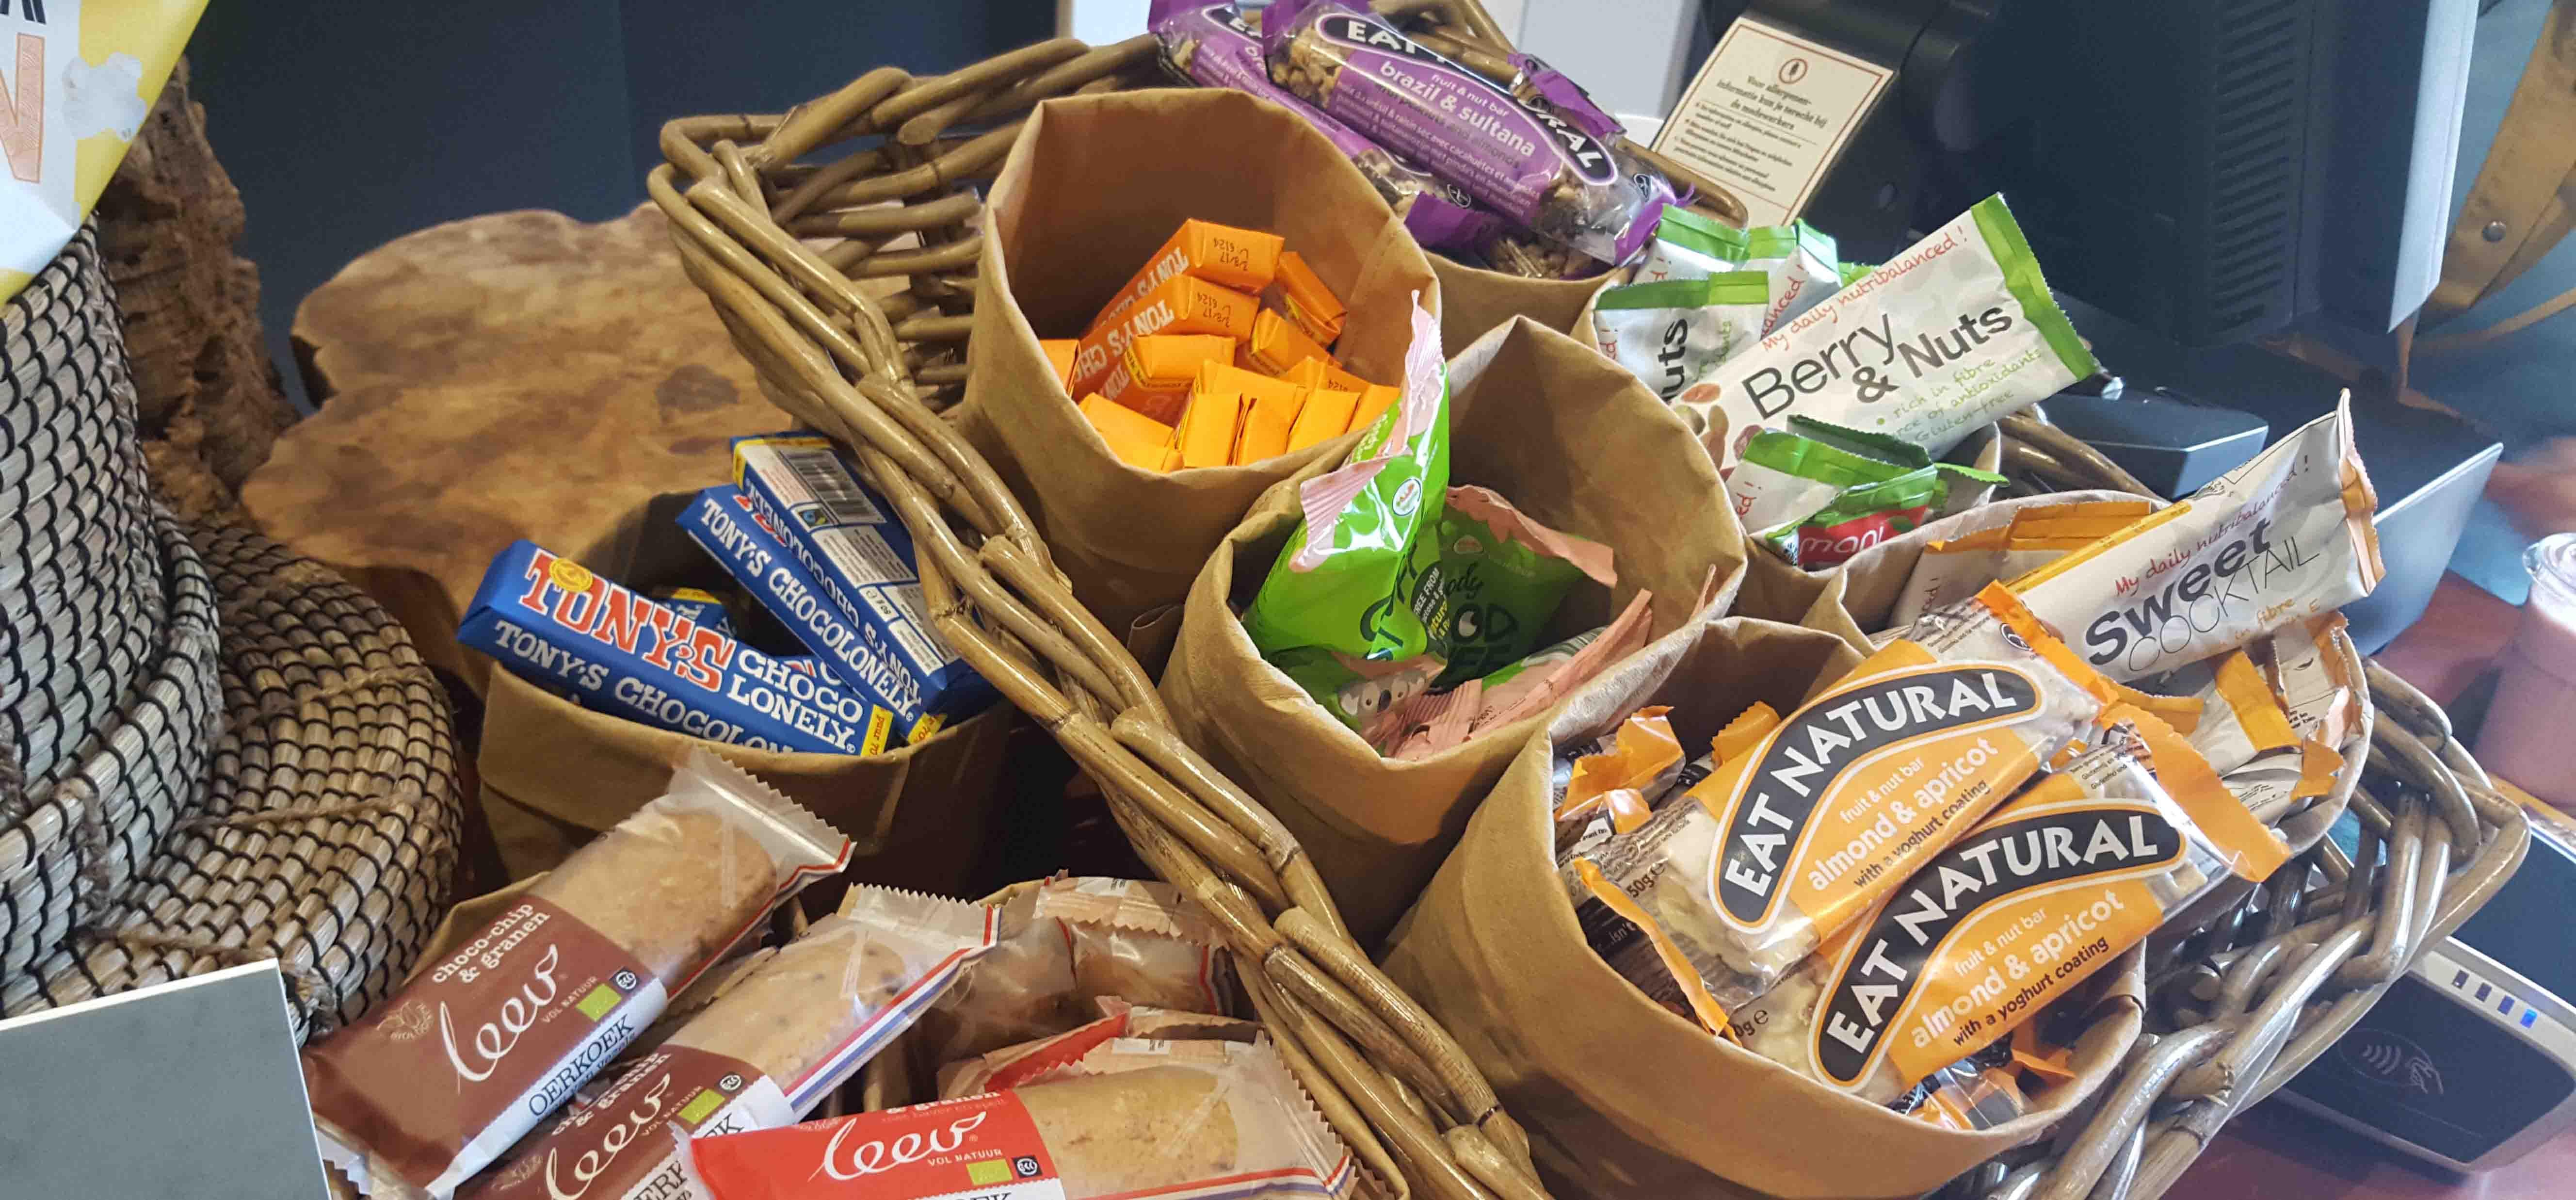 Gulden Gaarde snacks